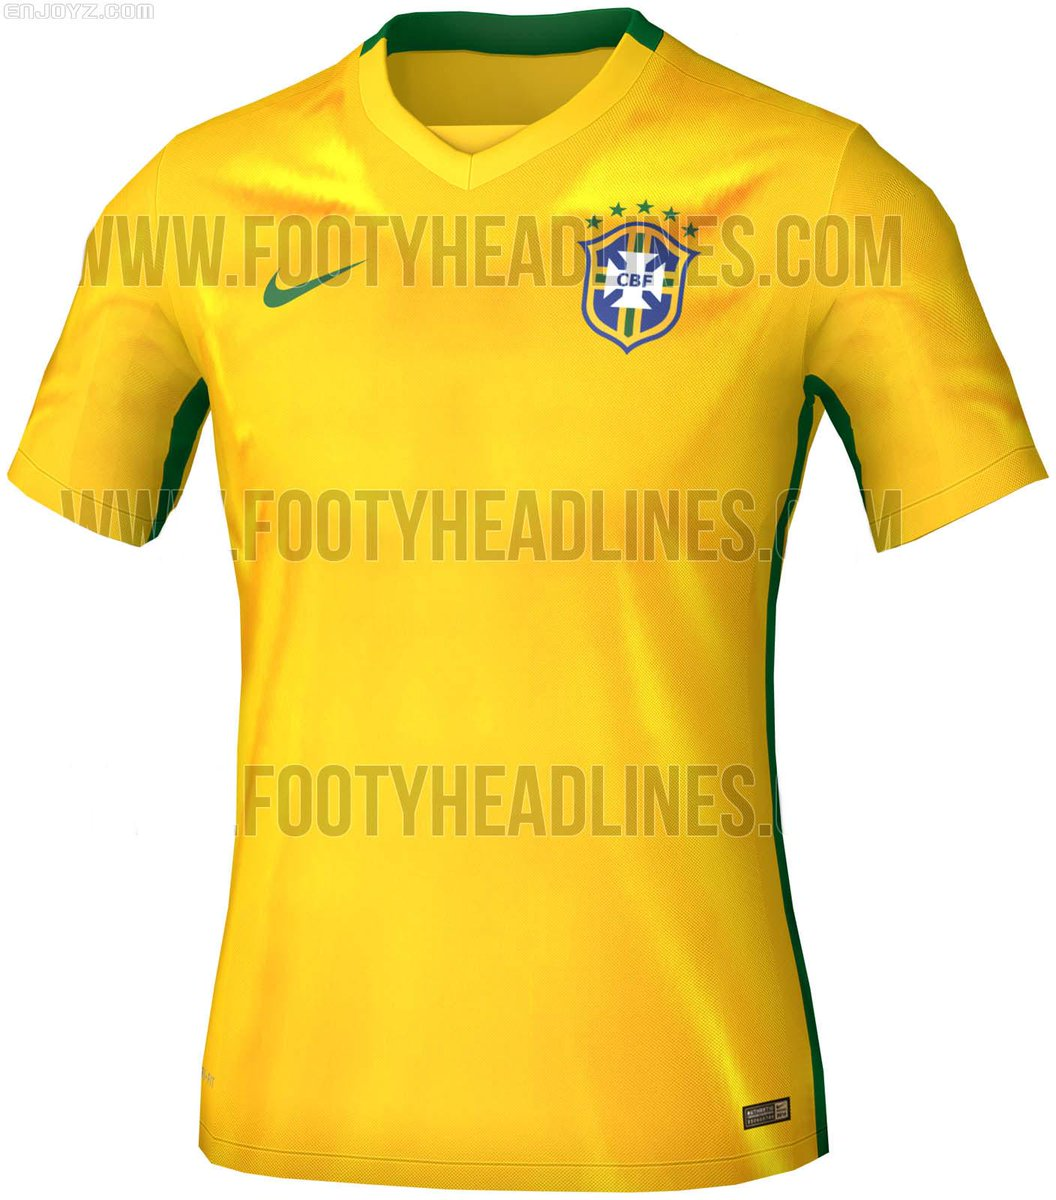 103f5fa635c Copa America 2015 Brazil national team home jersey recent exposure related  design. ...